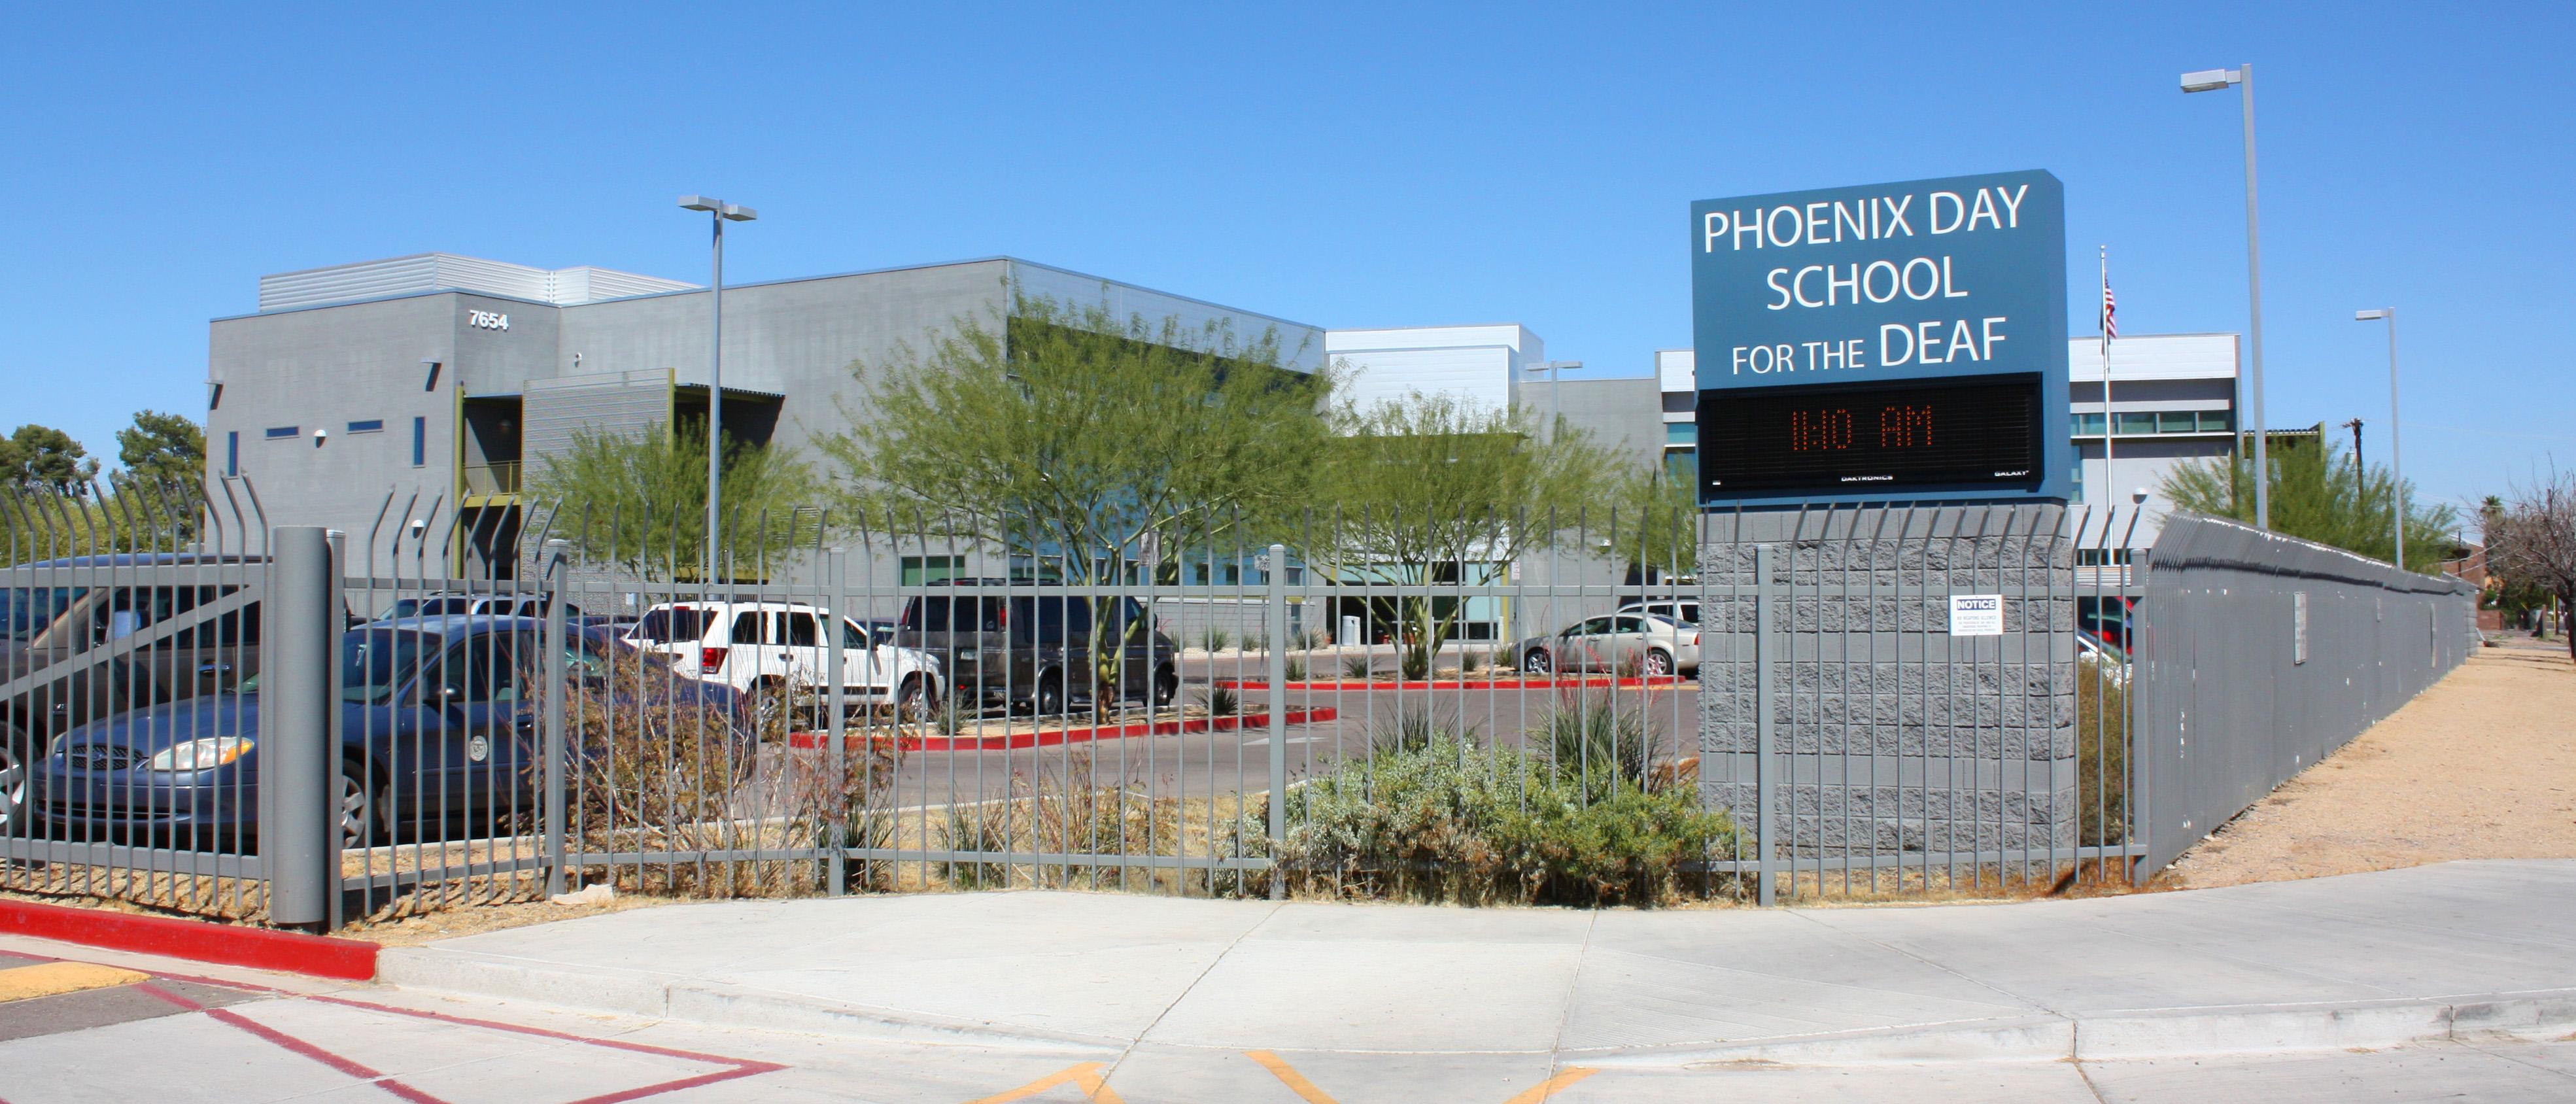 Phoenix Day School For The Deaf Ricor Inc